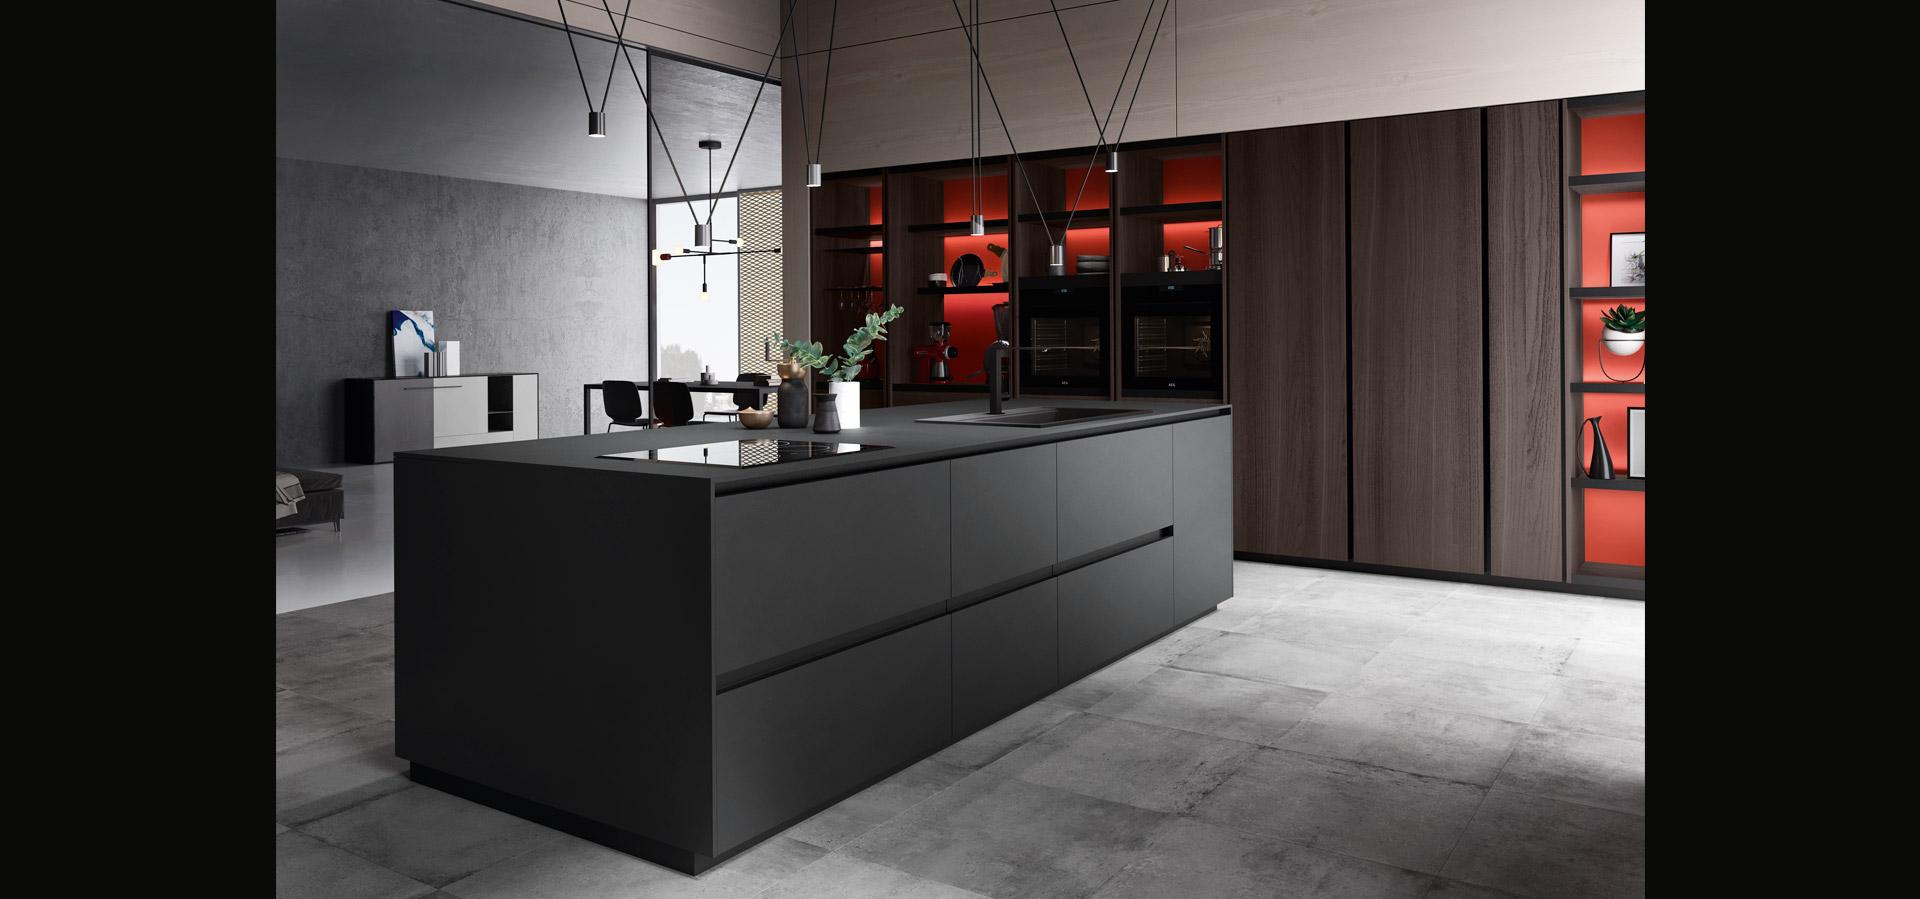 Cucina in bilaminato legno rovere | Ménta_04 | MITON Cucine